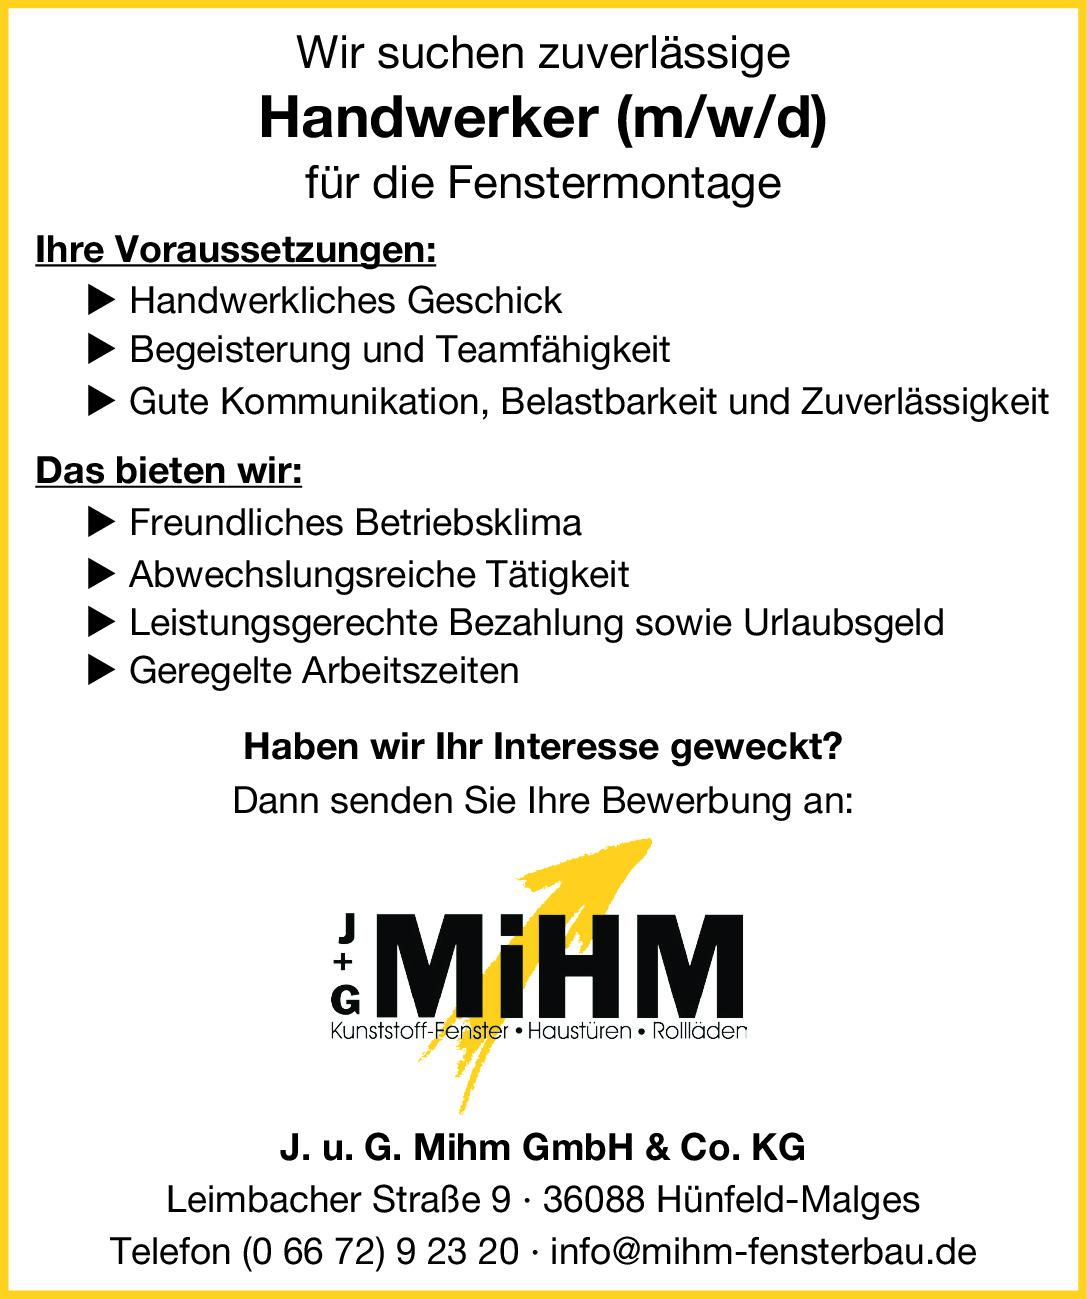 Handwerker (m/w/d)